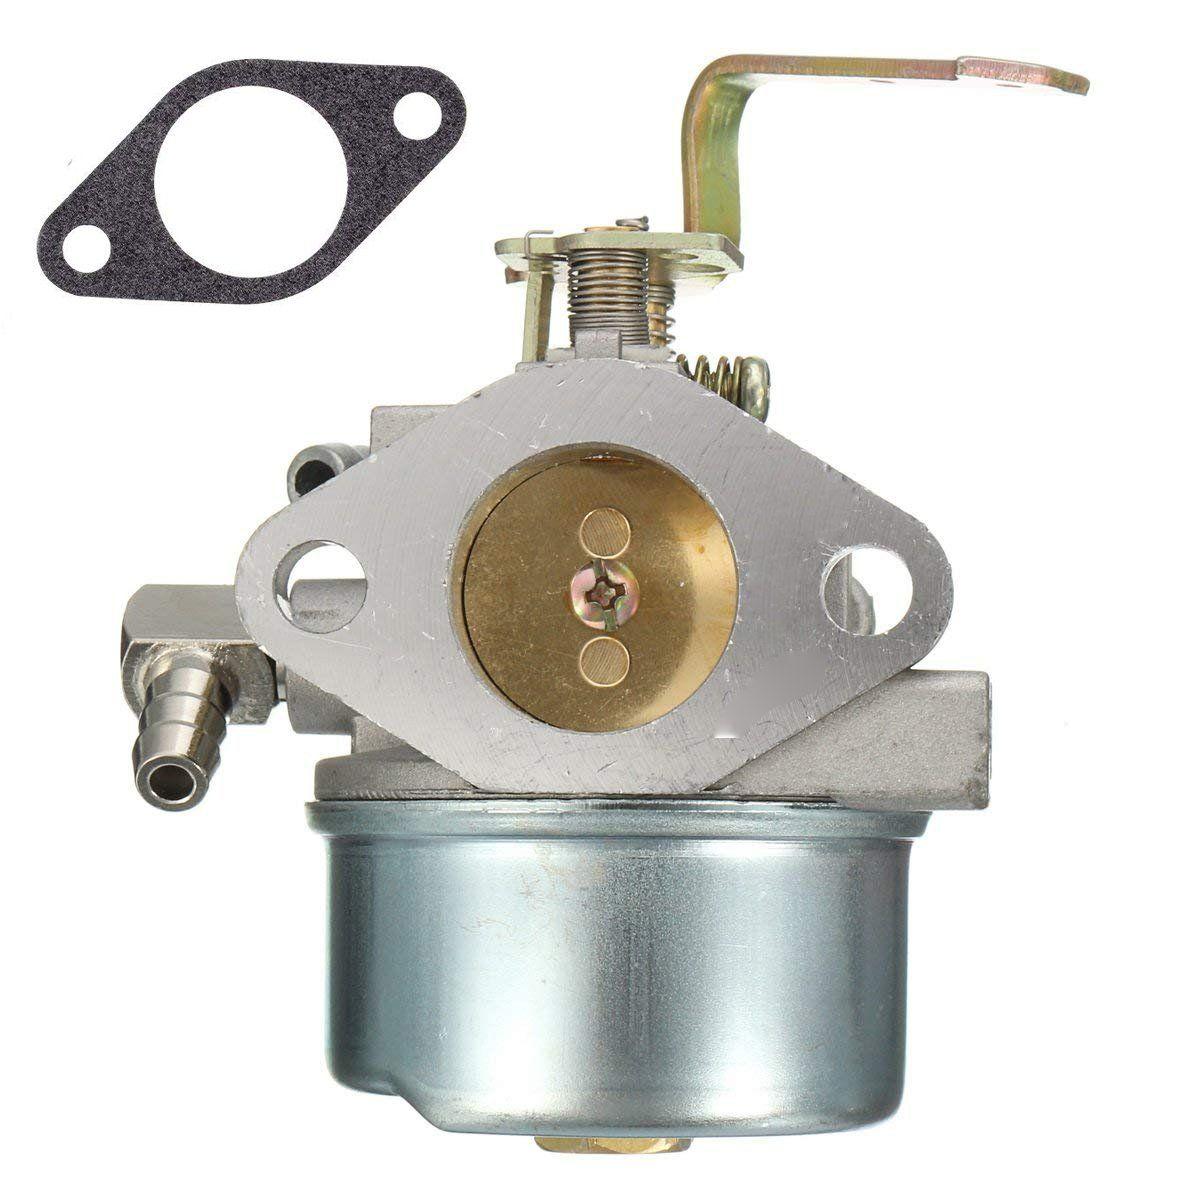 640152A Carburetor w/Air Filter for Tecumseh 640260